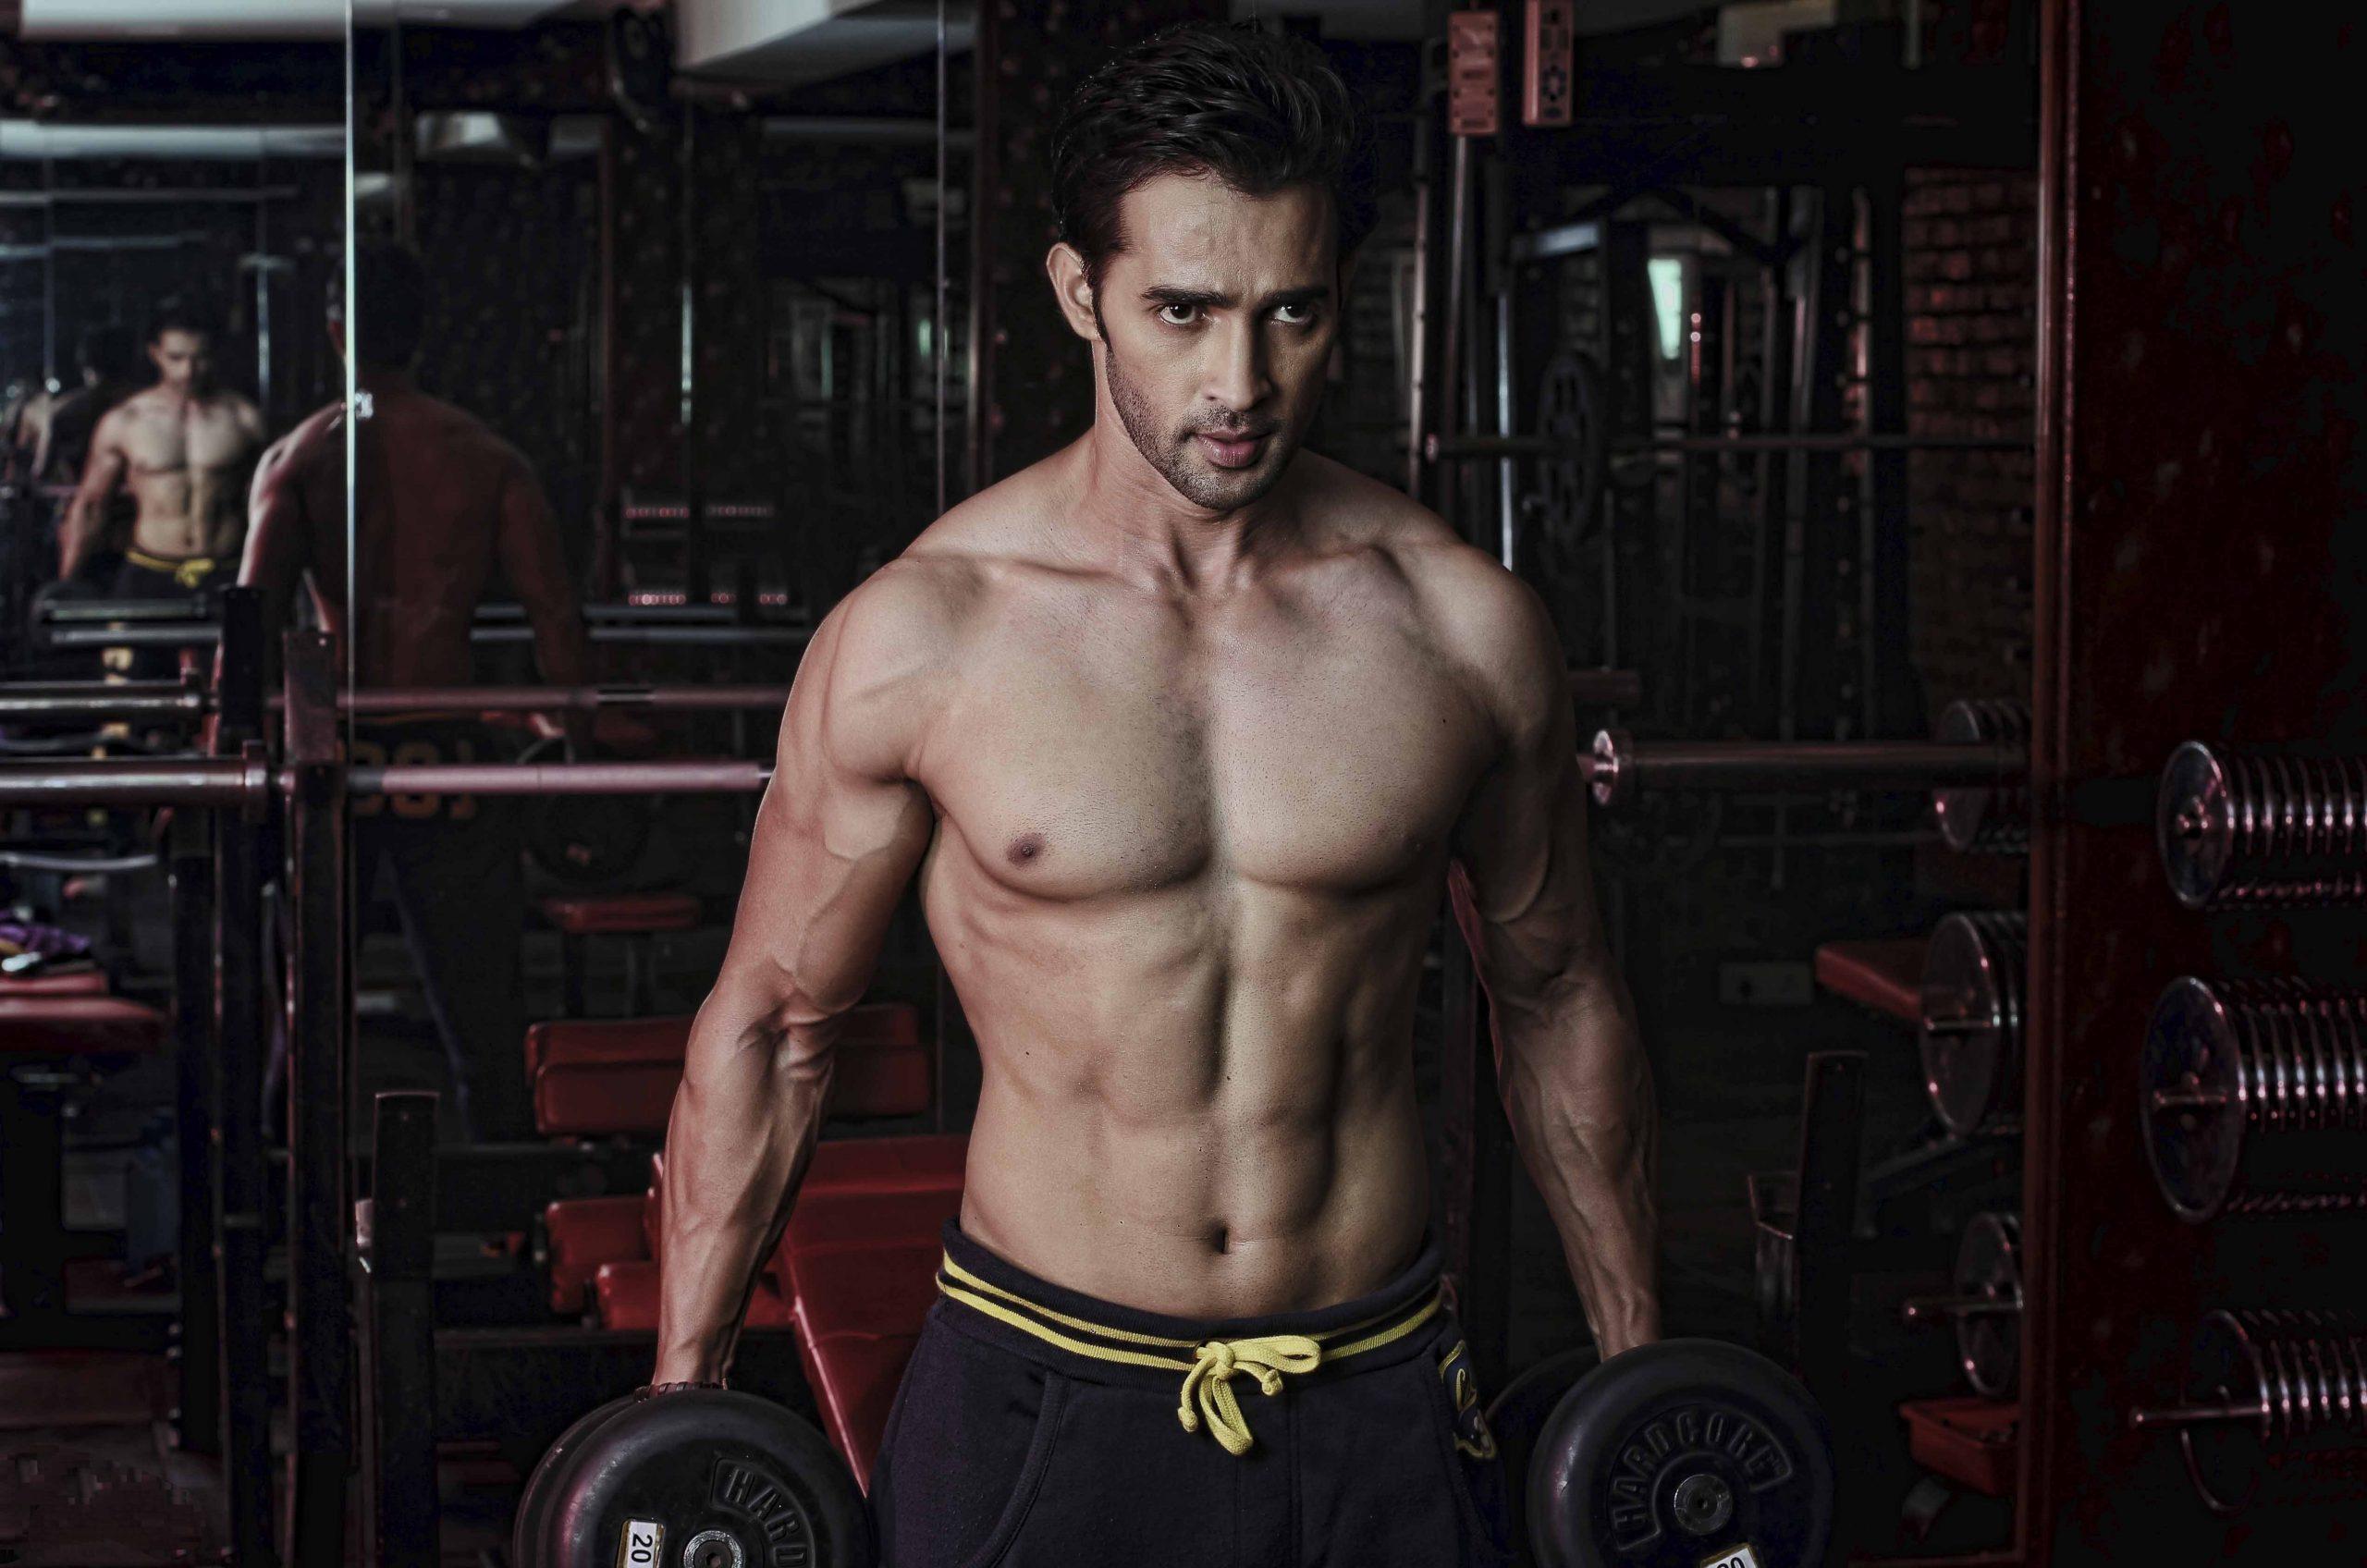 Man Workout